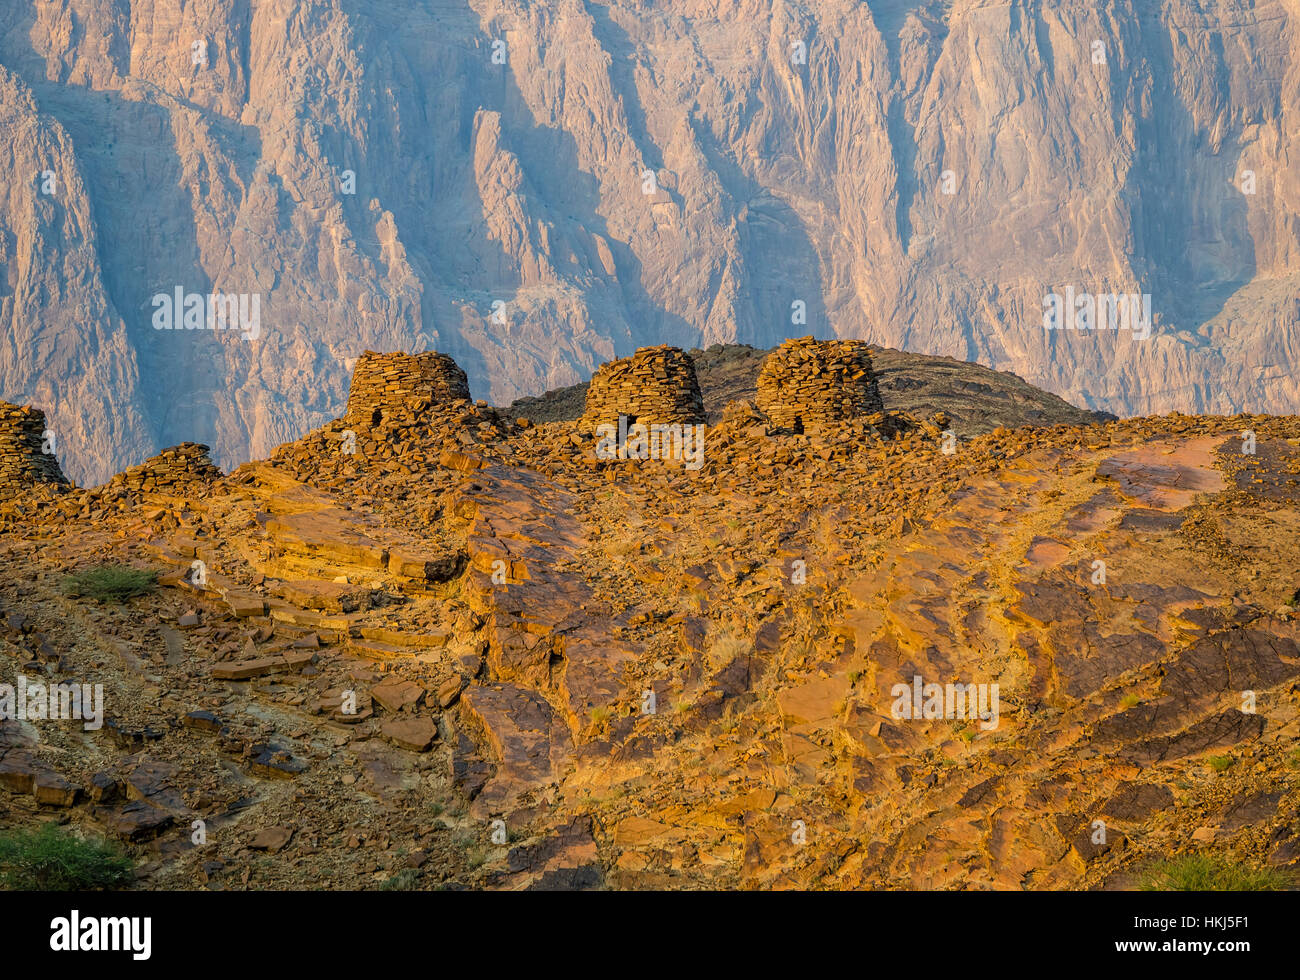 Archaeological site of Al-Ayn, beehive tombs, Jabal Misht mountains at back, Al Hajar Mountains, Al Dhahirah Region, - Stock Image